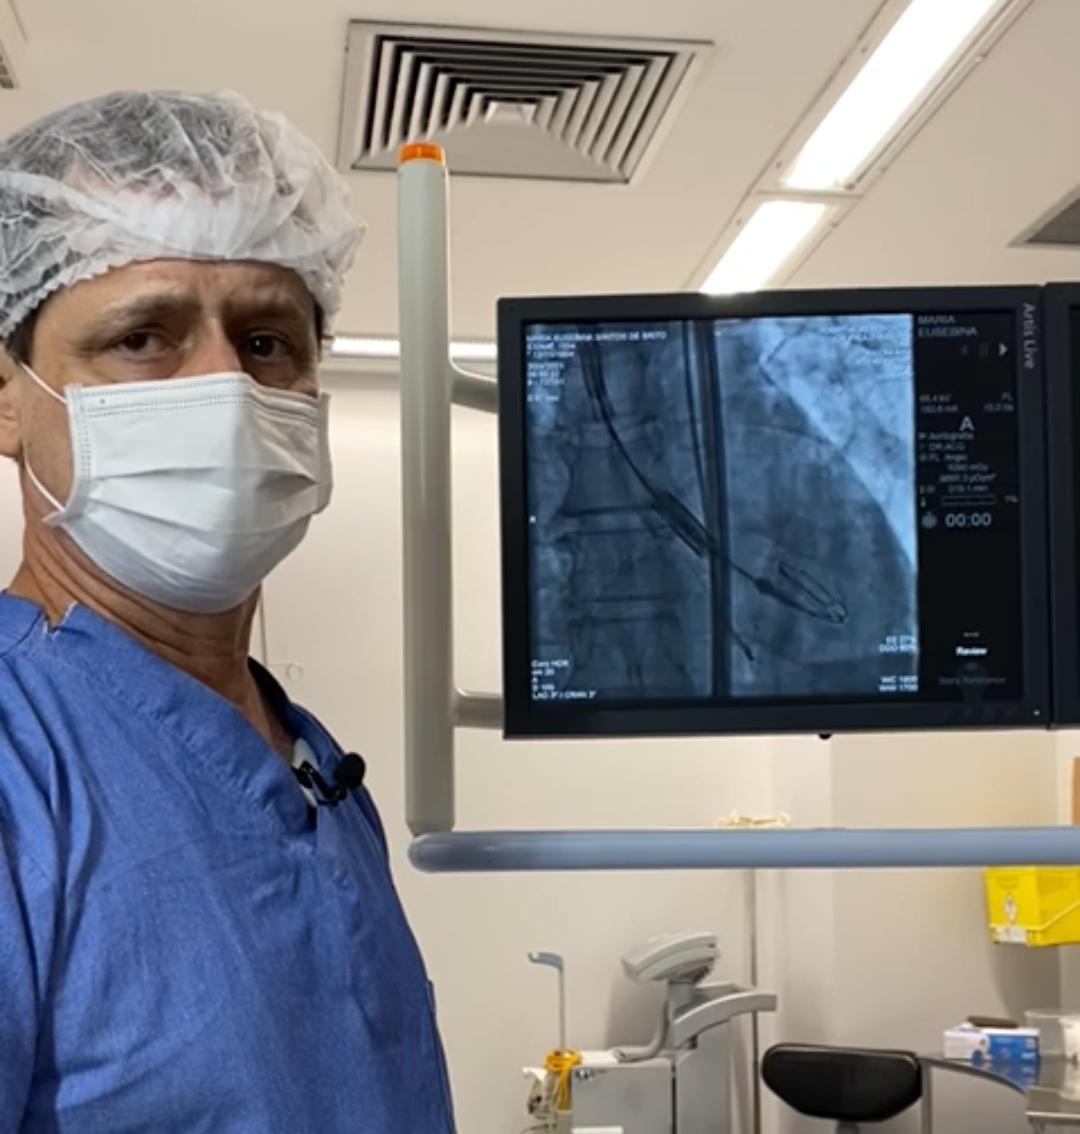 Procedimento cardíaco menos invasivo é realizado no Hospital Aeroporto